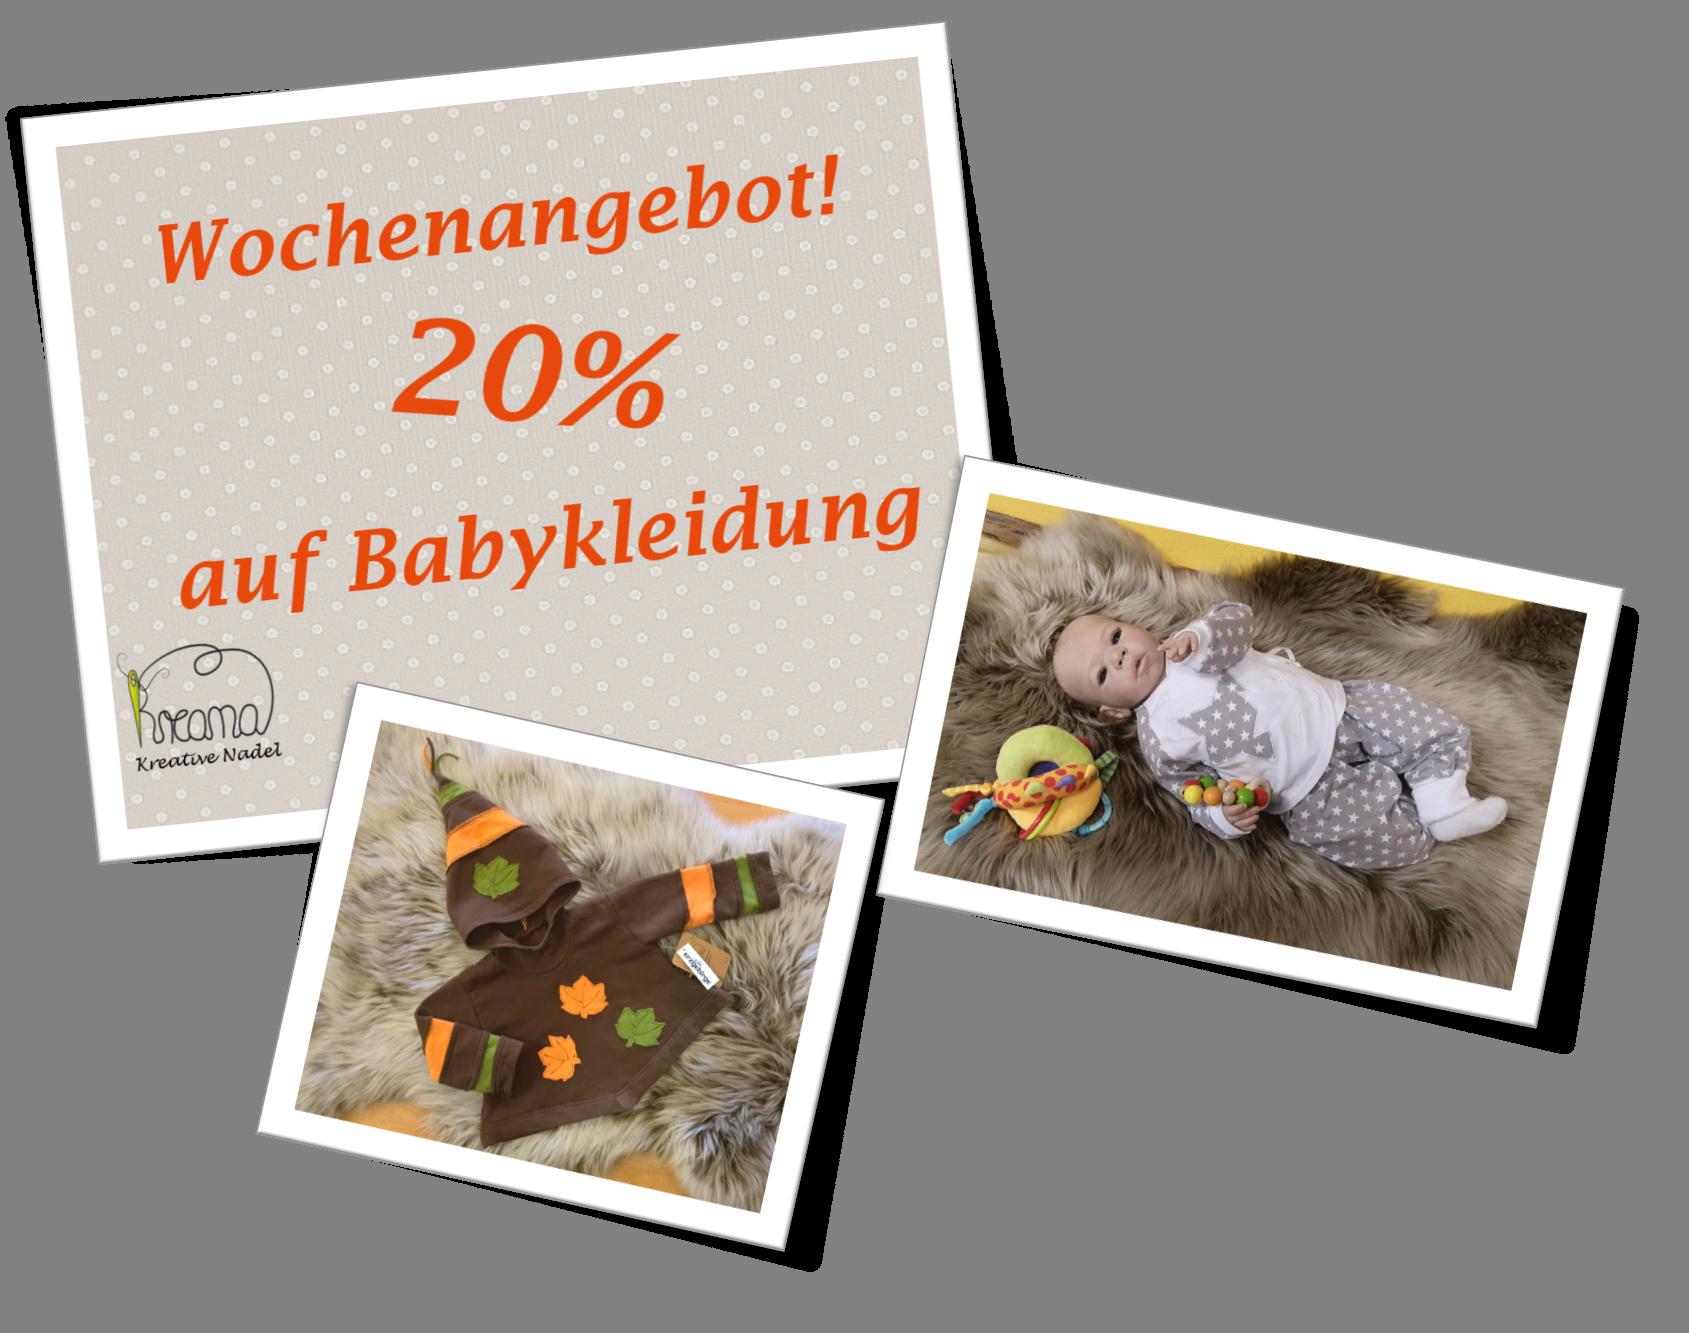 Wochenangebot Babykleidung